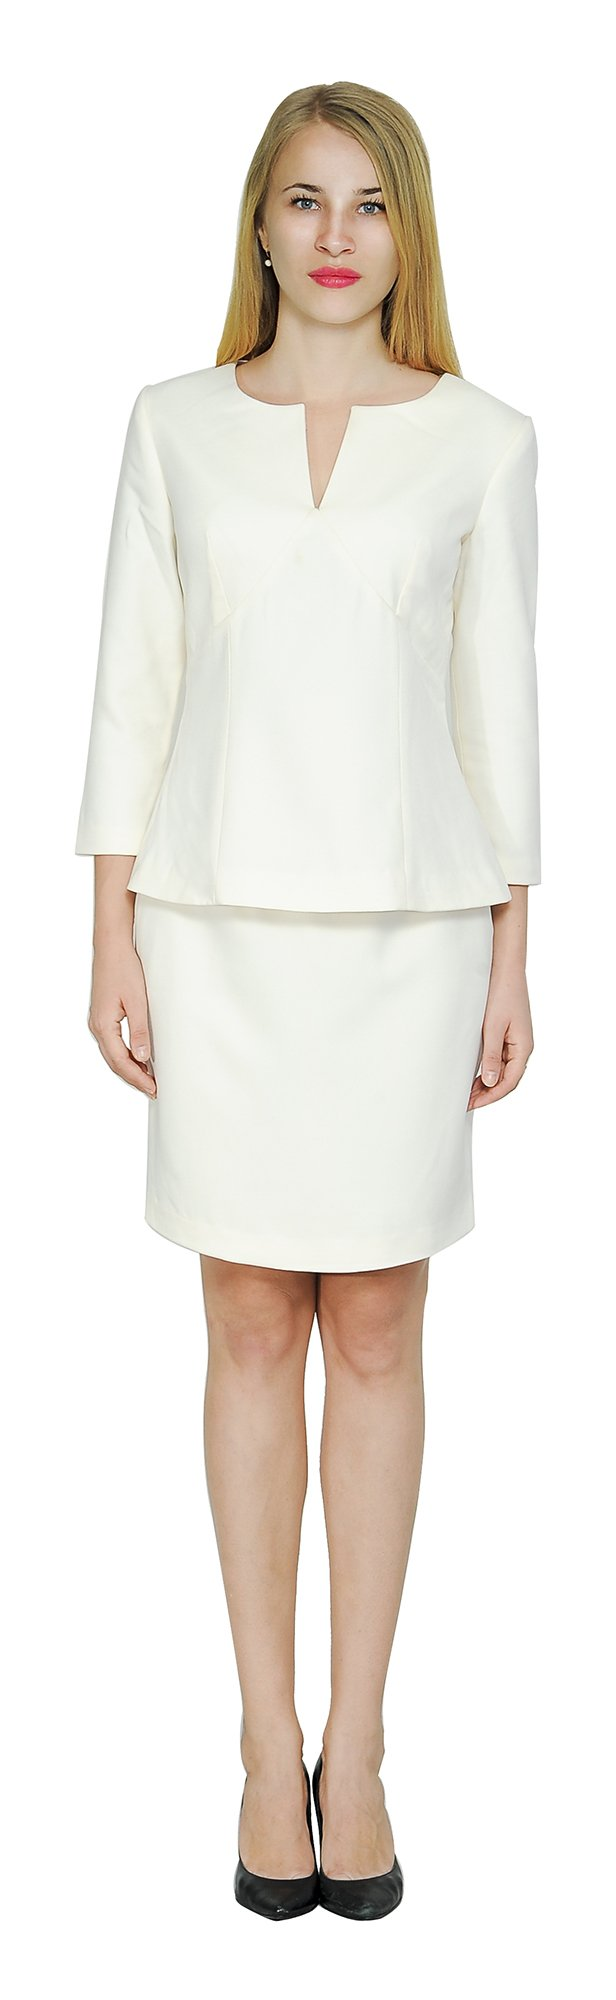 Marycrafts Women's Elegant Skirt Suit Set Work Office Business Wear 12 Beige